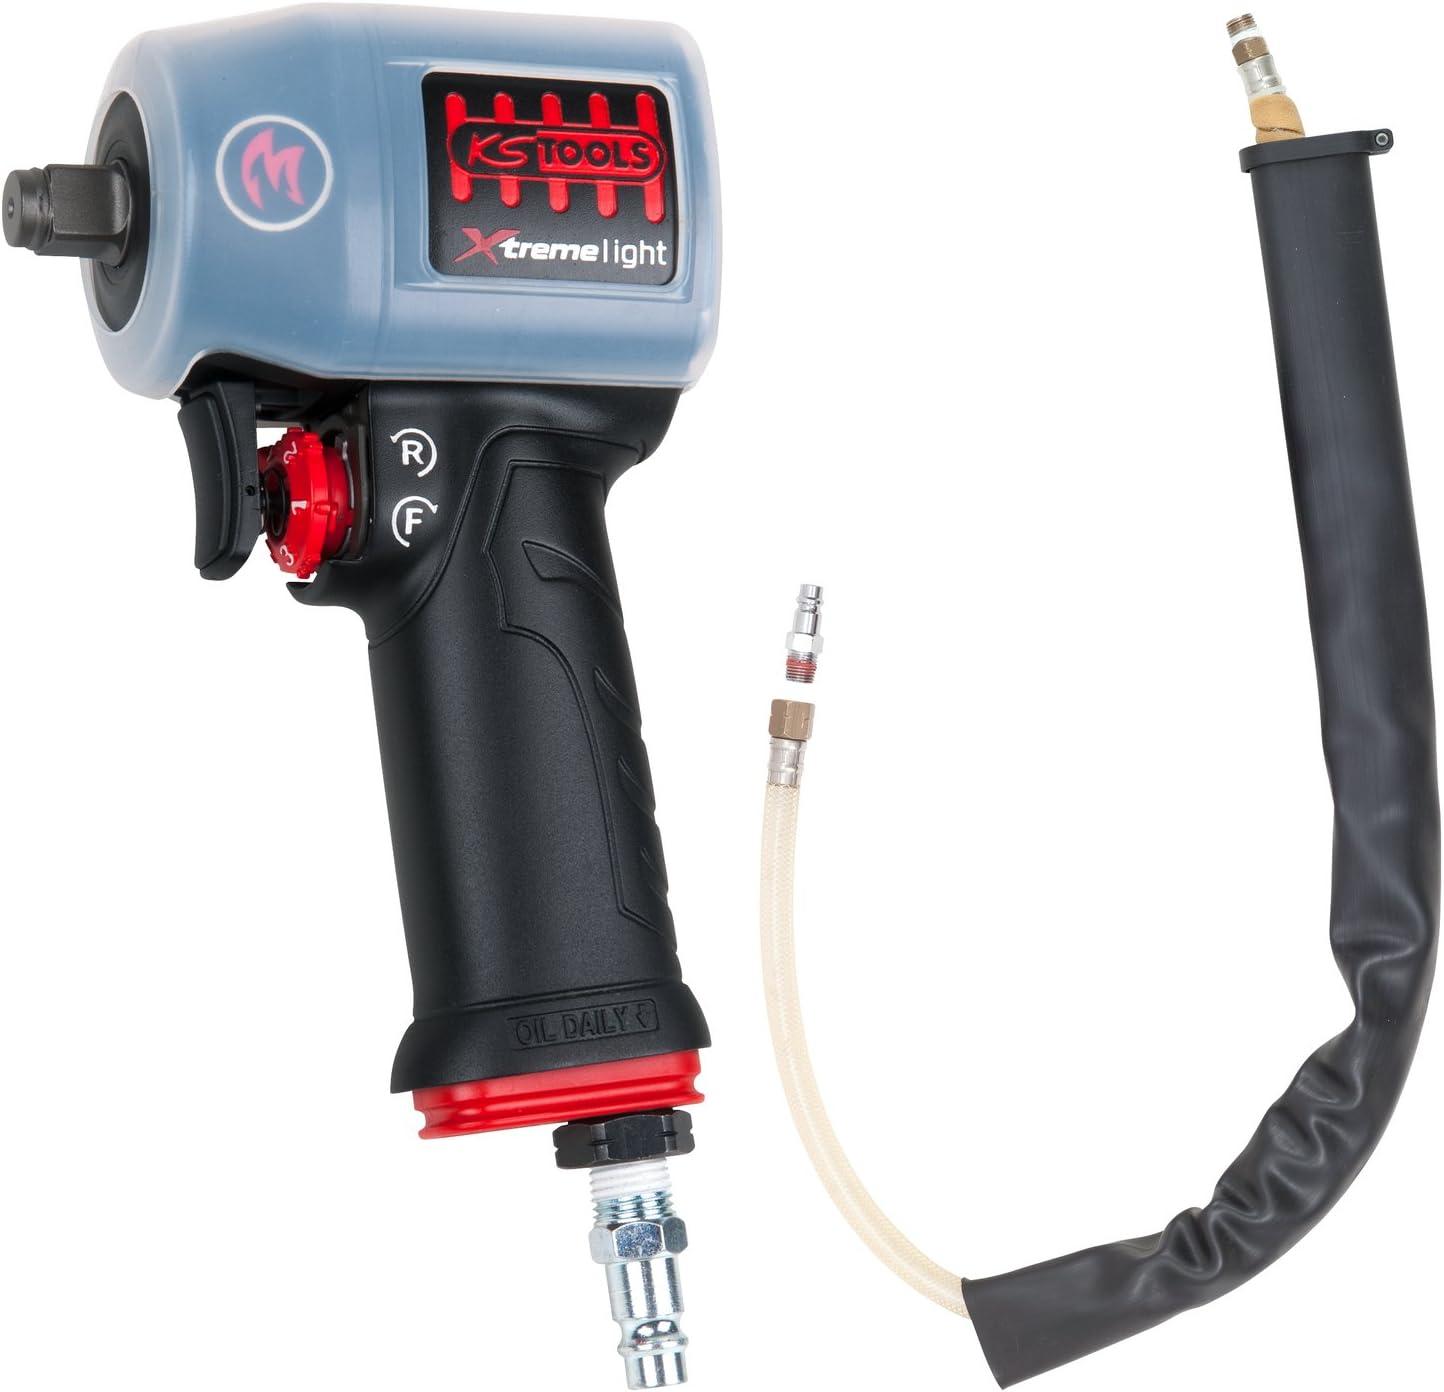 KS Tools 515.1155 miniMONSTER Xtremelight - Llave de impacto de aire comprimido, 515.1155